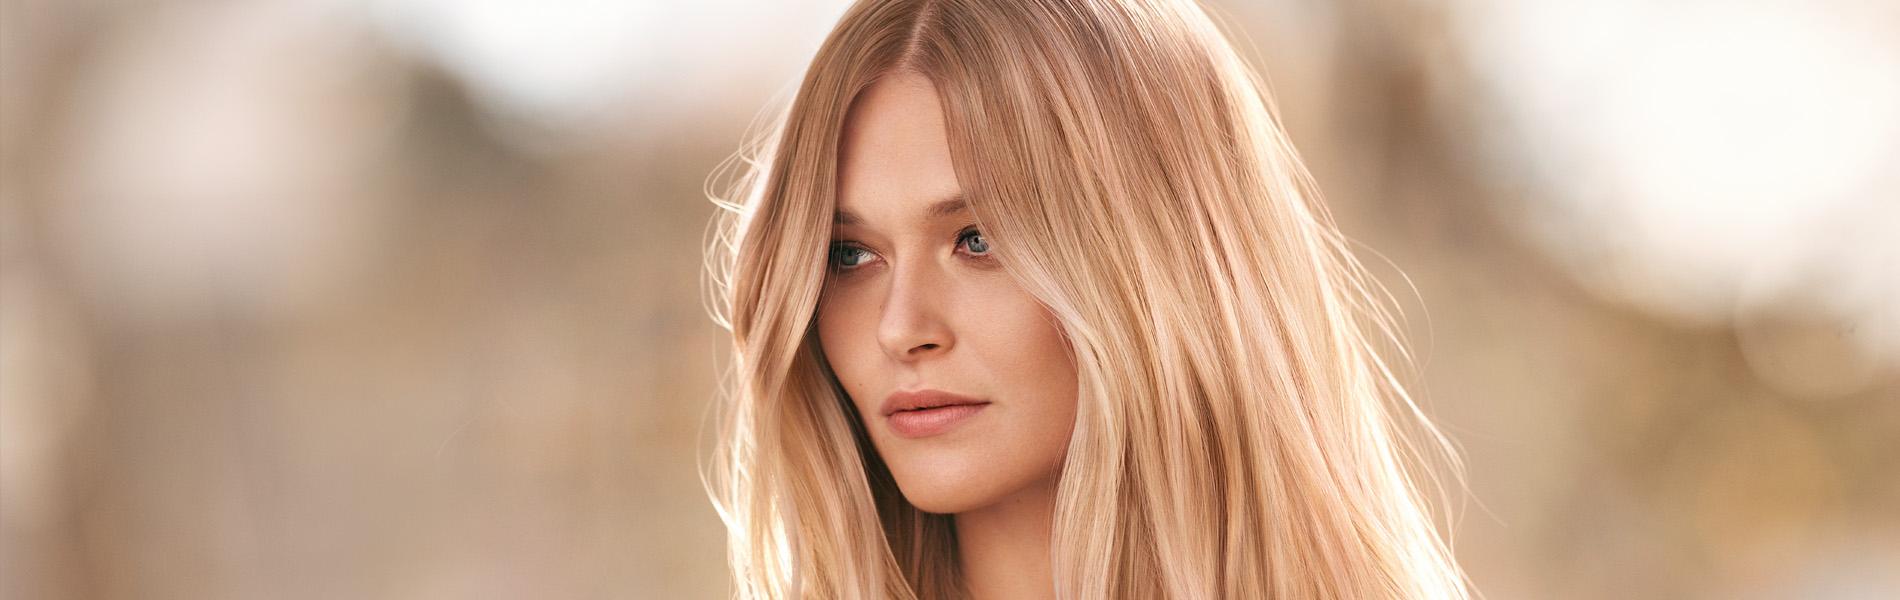 salon de coiffure confidences lyon